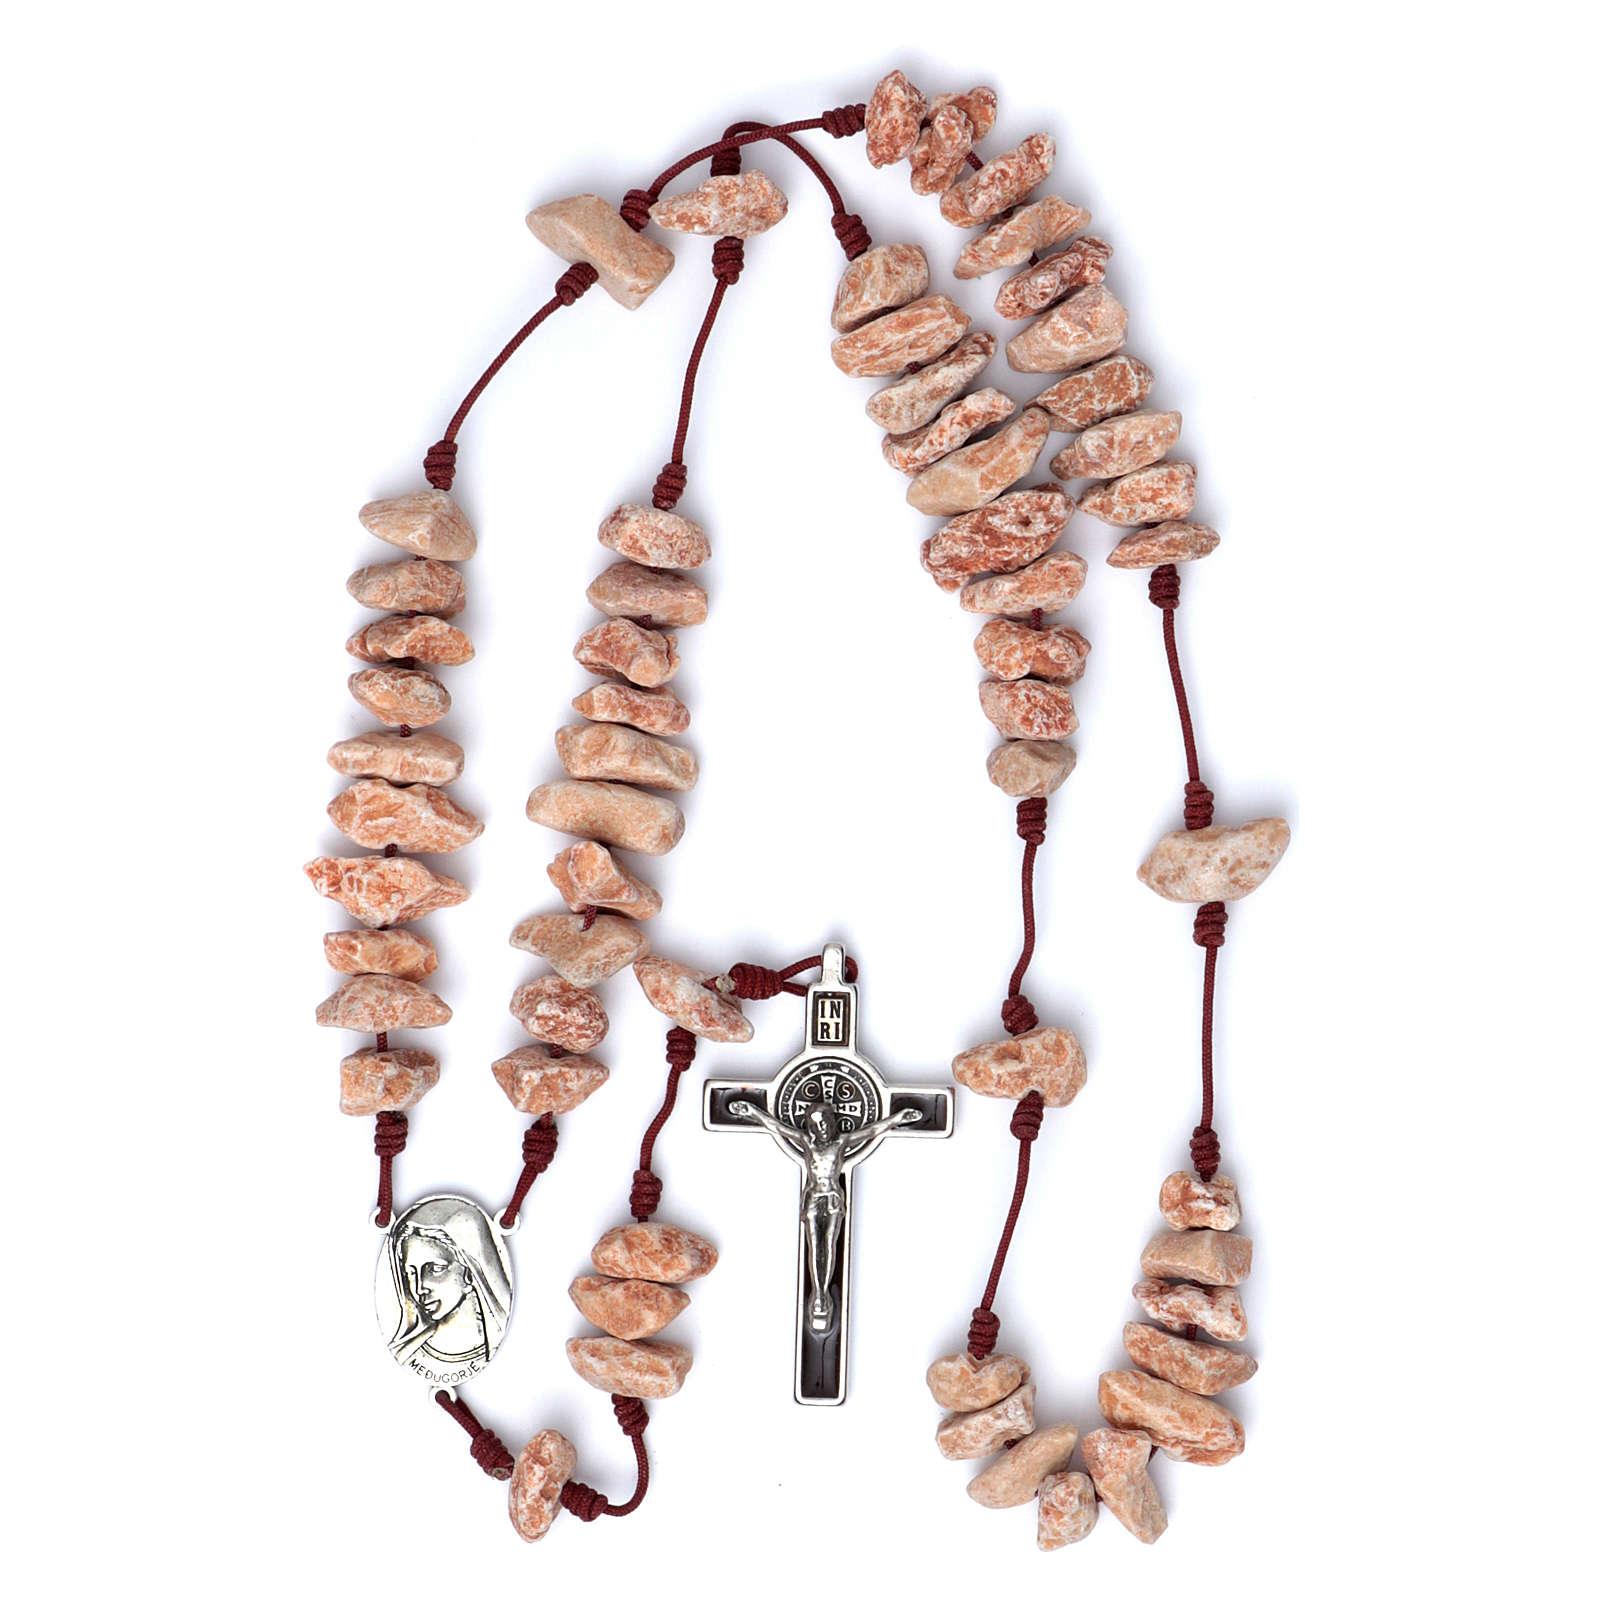 Medjugorje headboard rosary in red stone 4